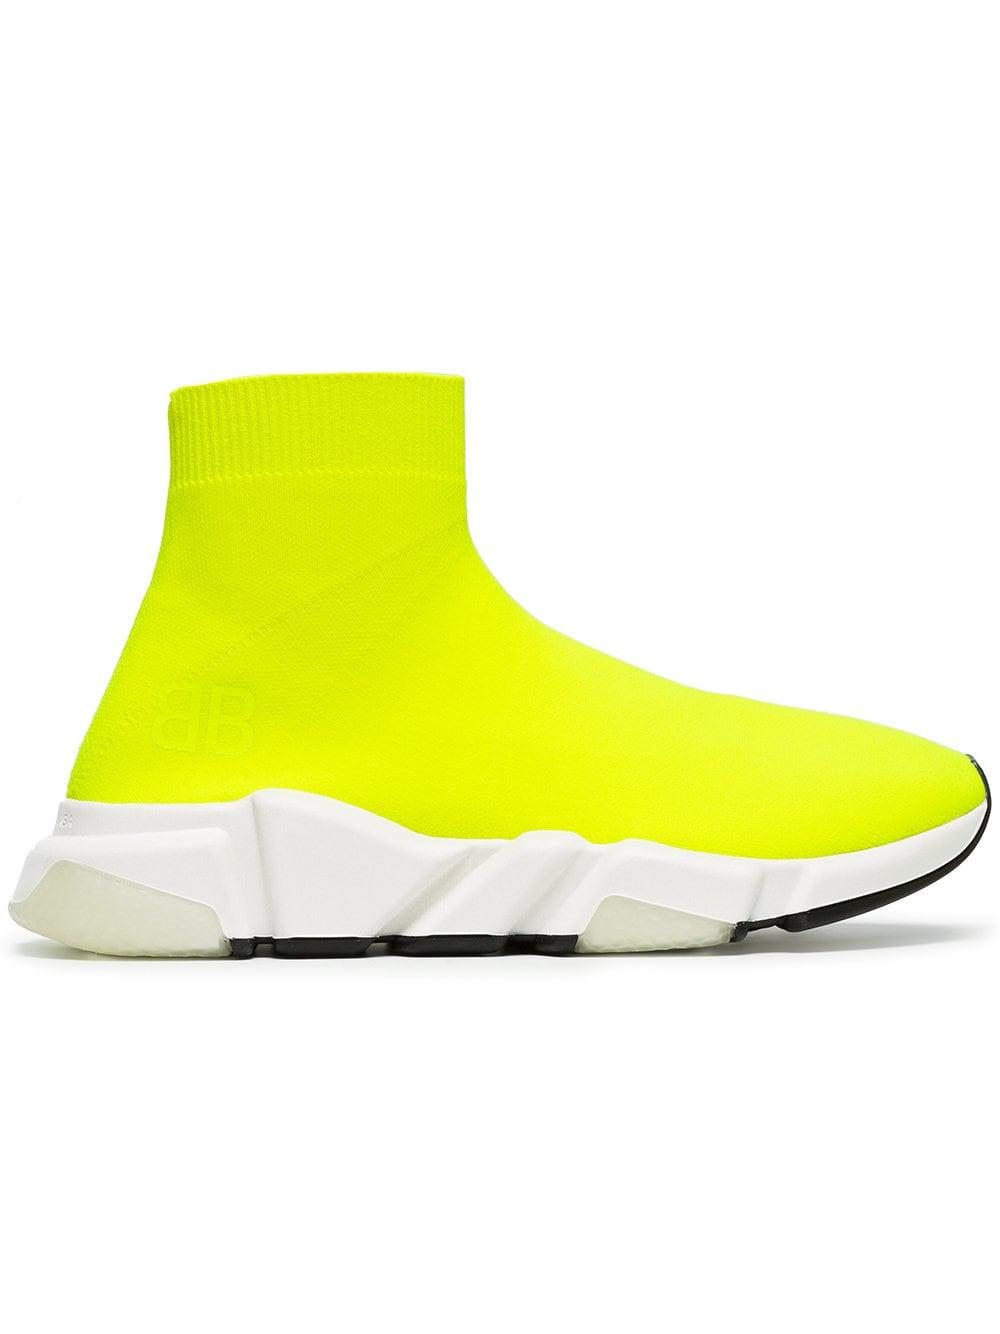 Neon Yellow Speed Sneakers- £525 Balenciaga